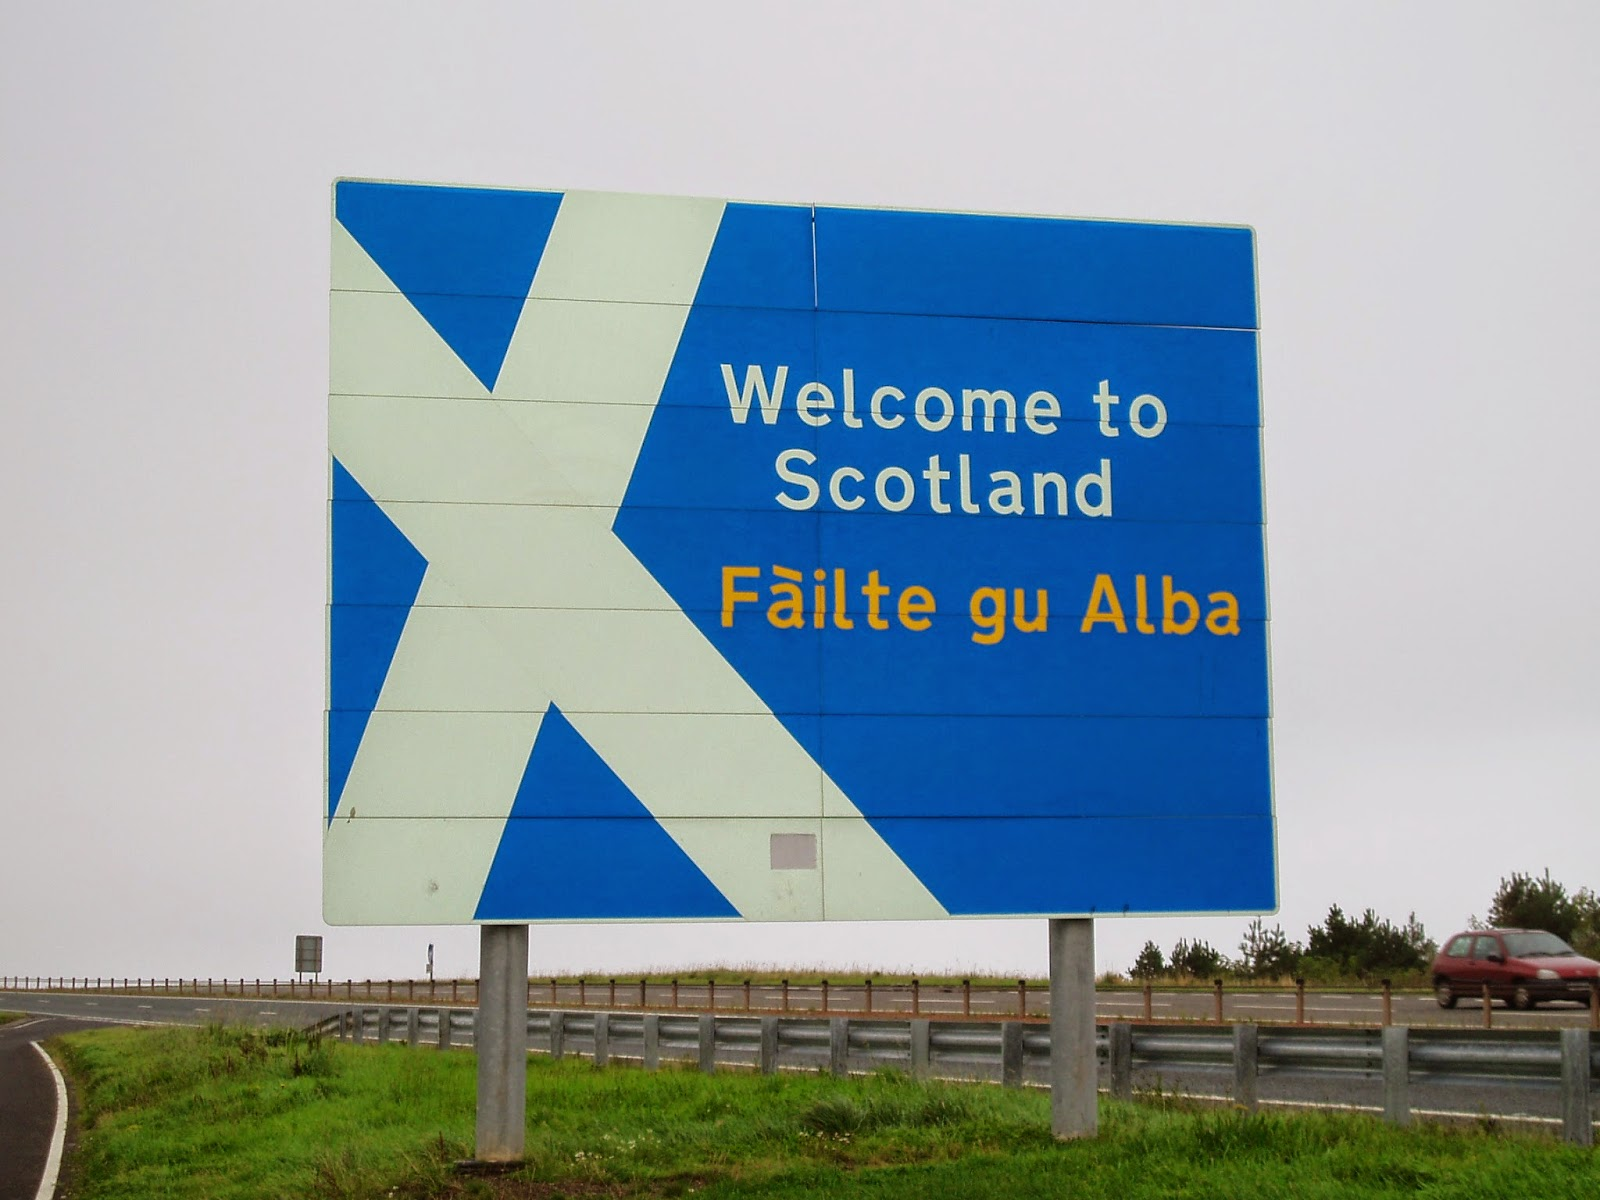 scotland keluar dari GB